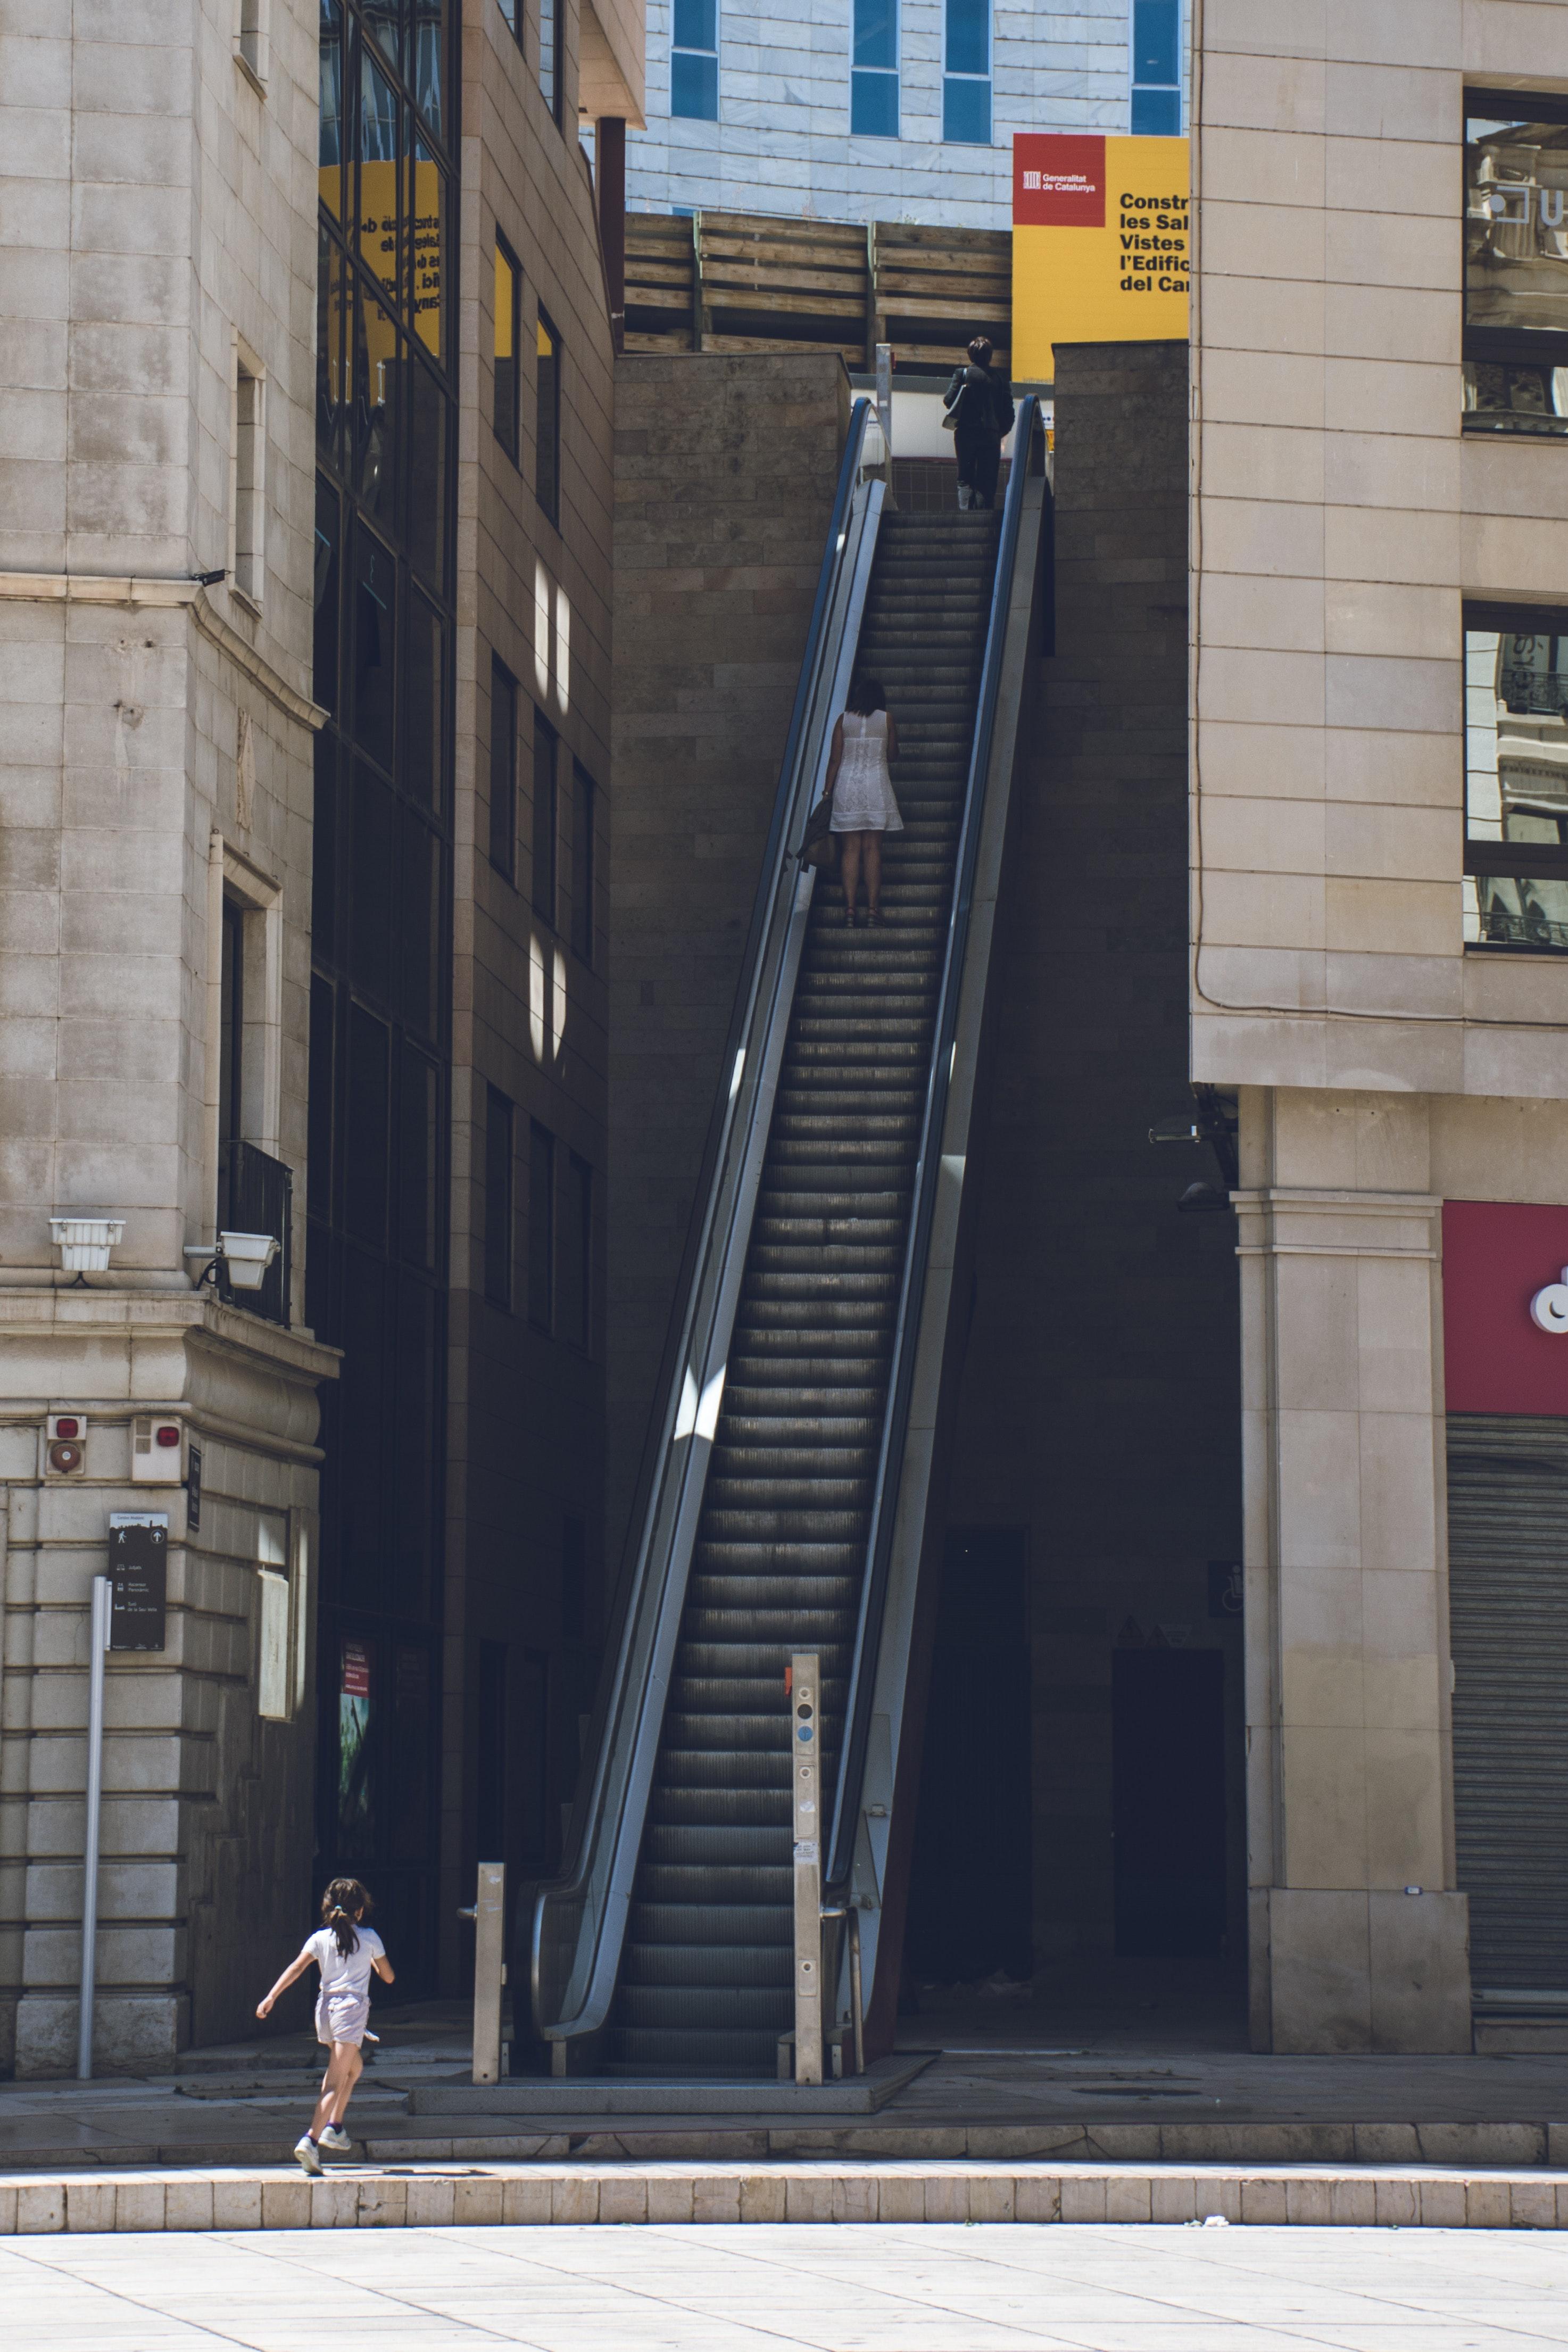 Girl walking towards the escalator photo